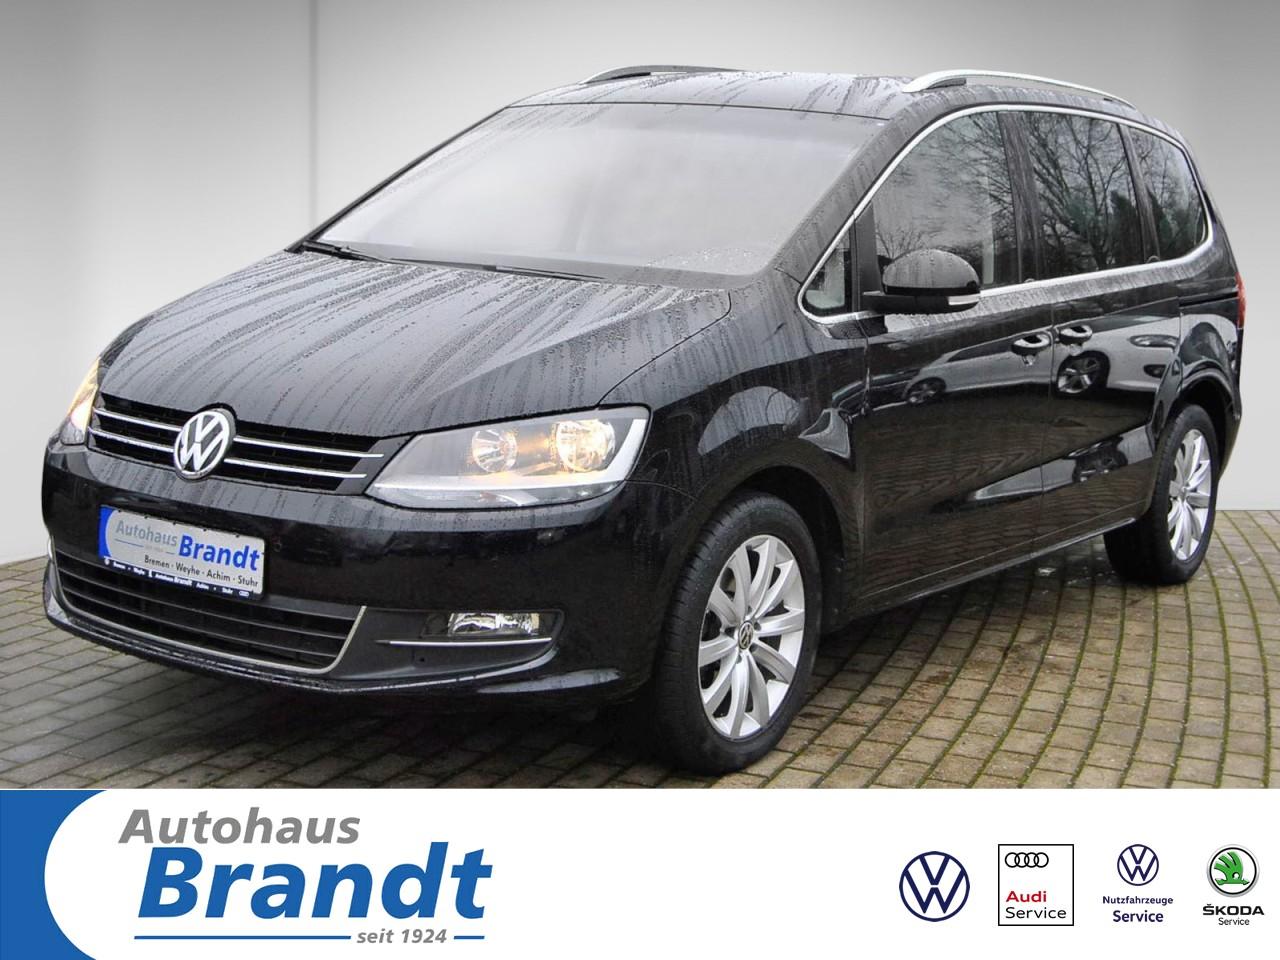 Volkswagen Sharan 1.4 TSI Highline NAVI*KAMERA*7-SITZER*ALCANTARA*AHK, Jahr 2016, Benzin